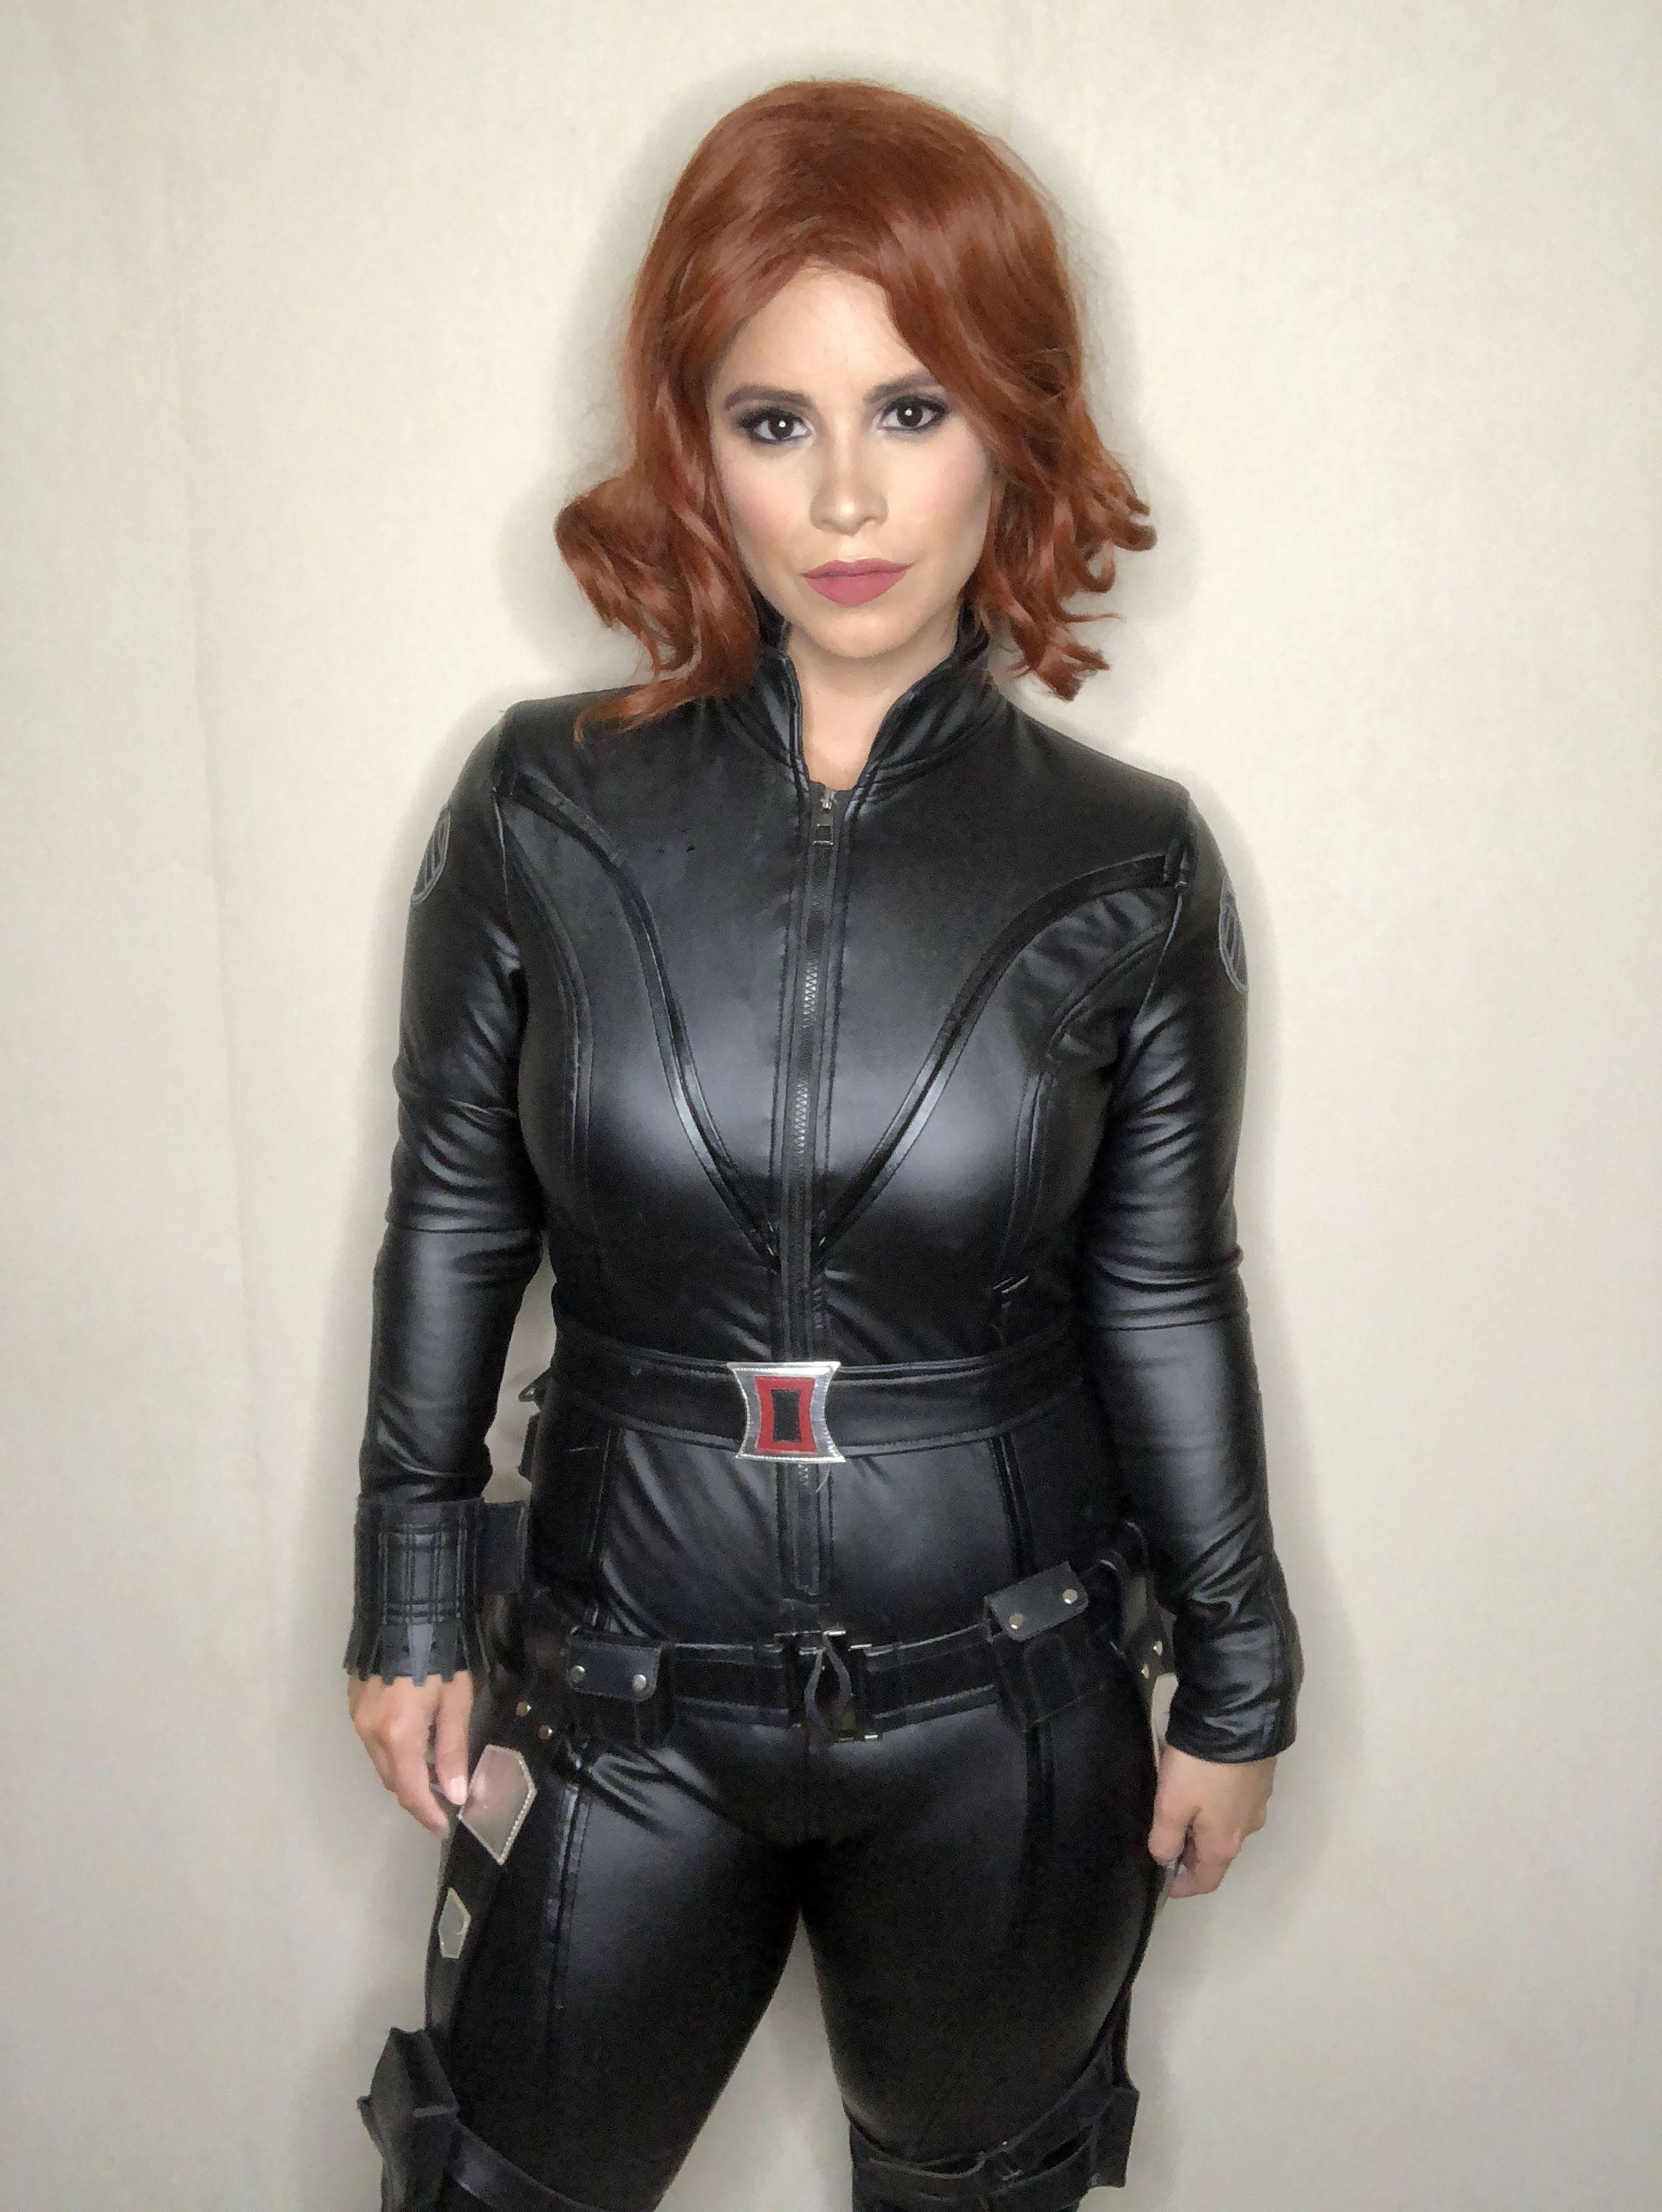 Black widow costume black widow costume leather jacket